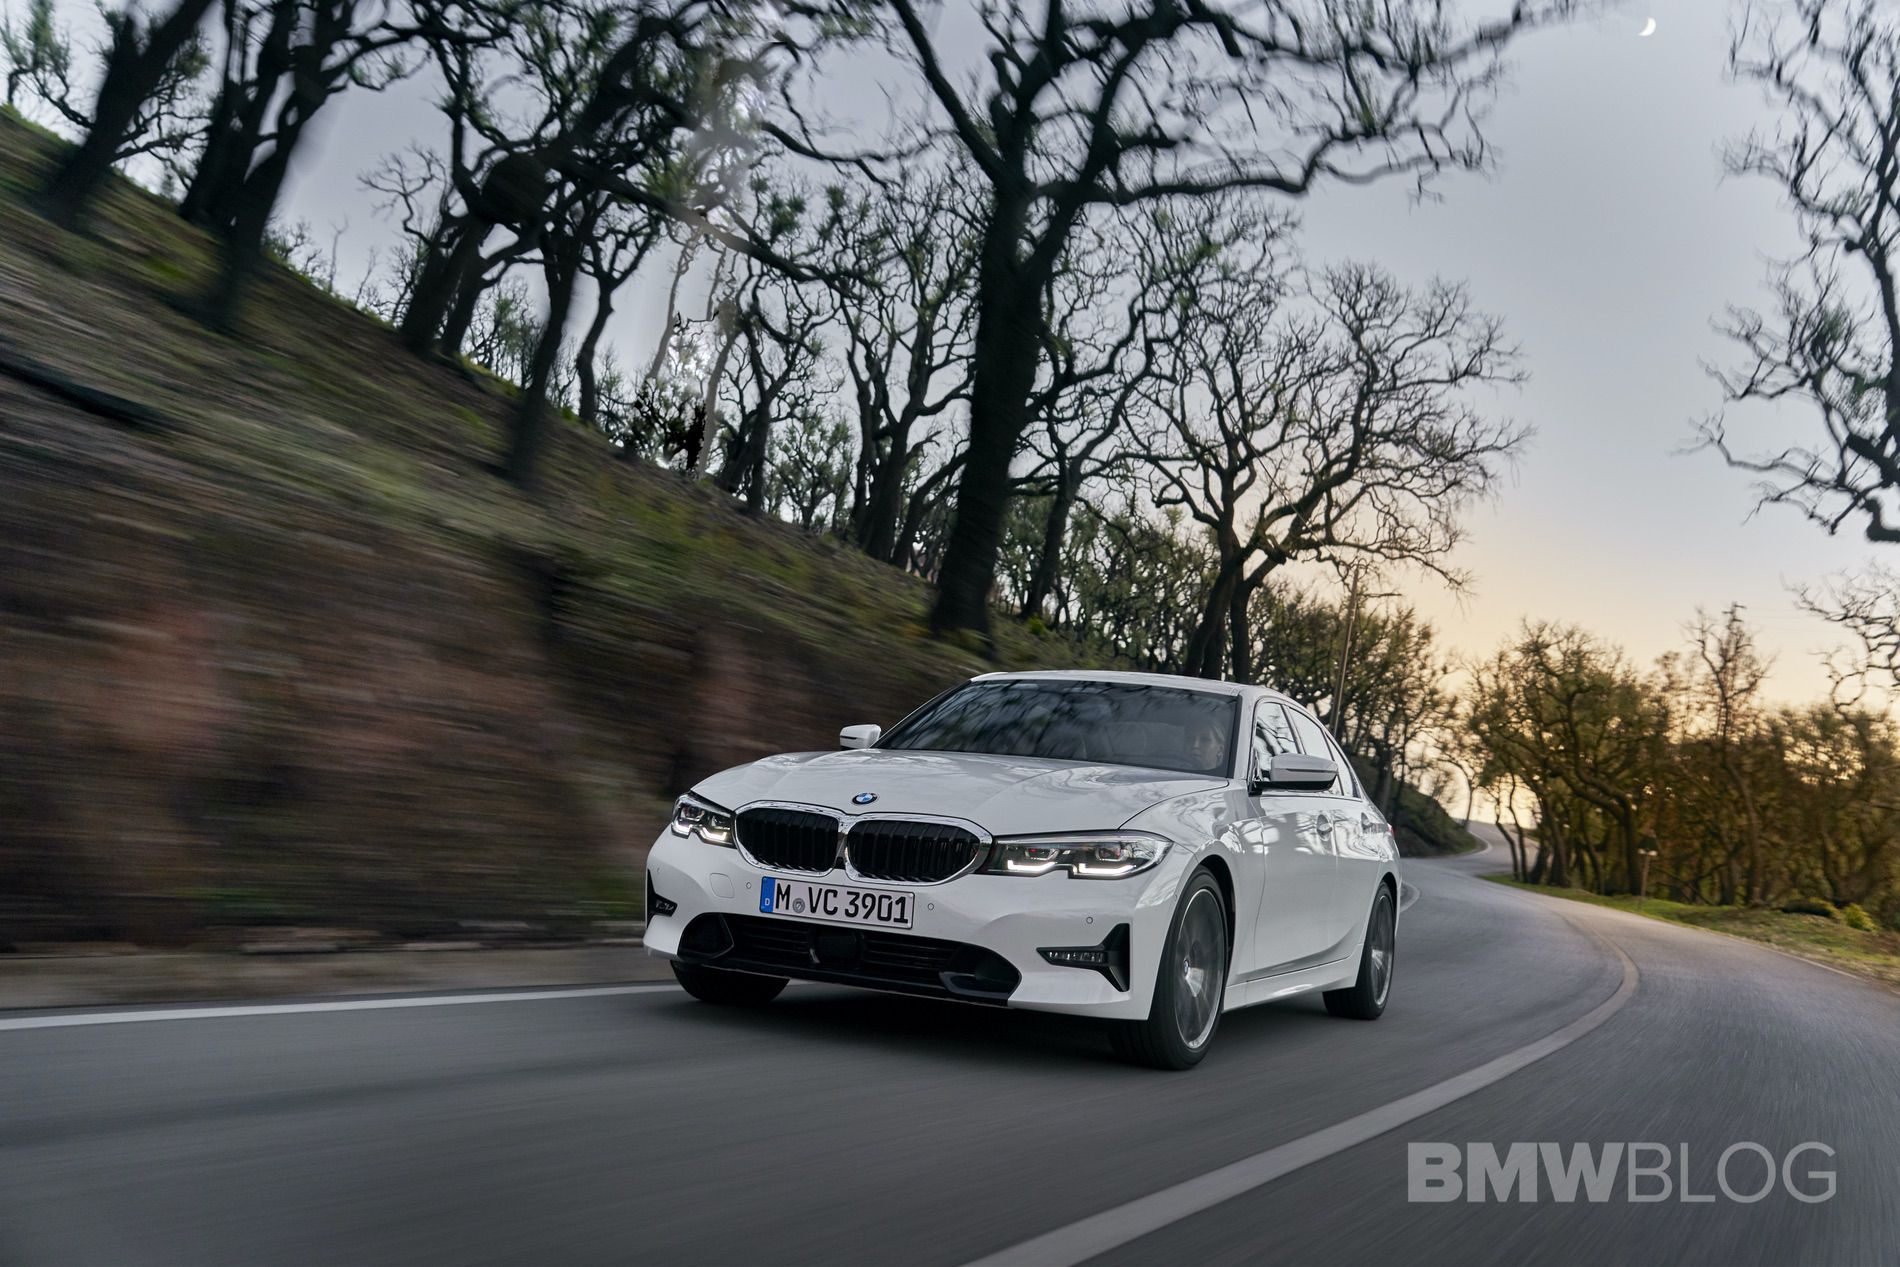 2019 BMW 320d G20 test drive 70